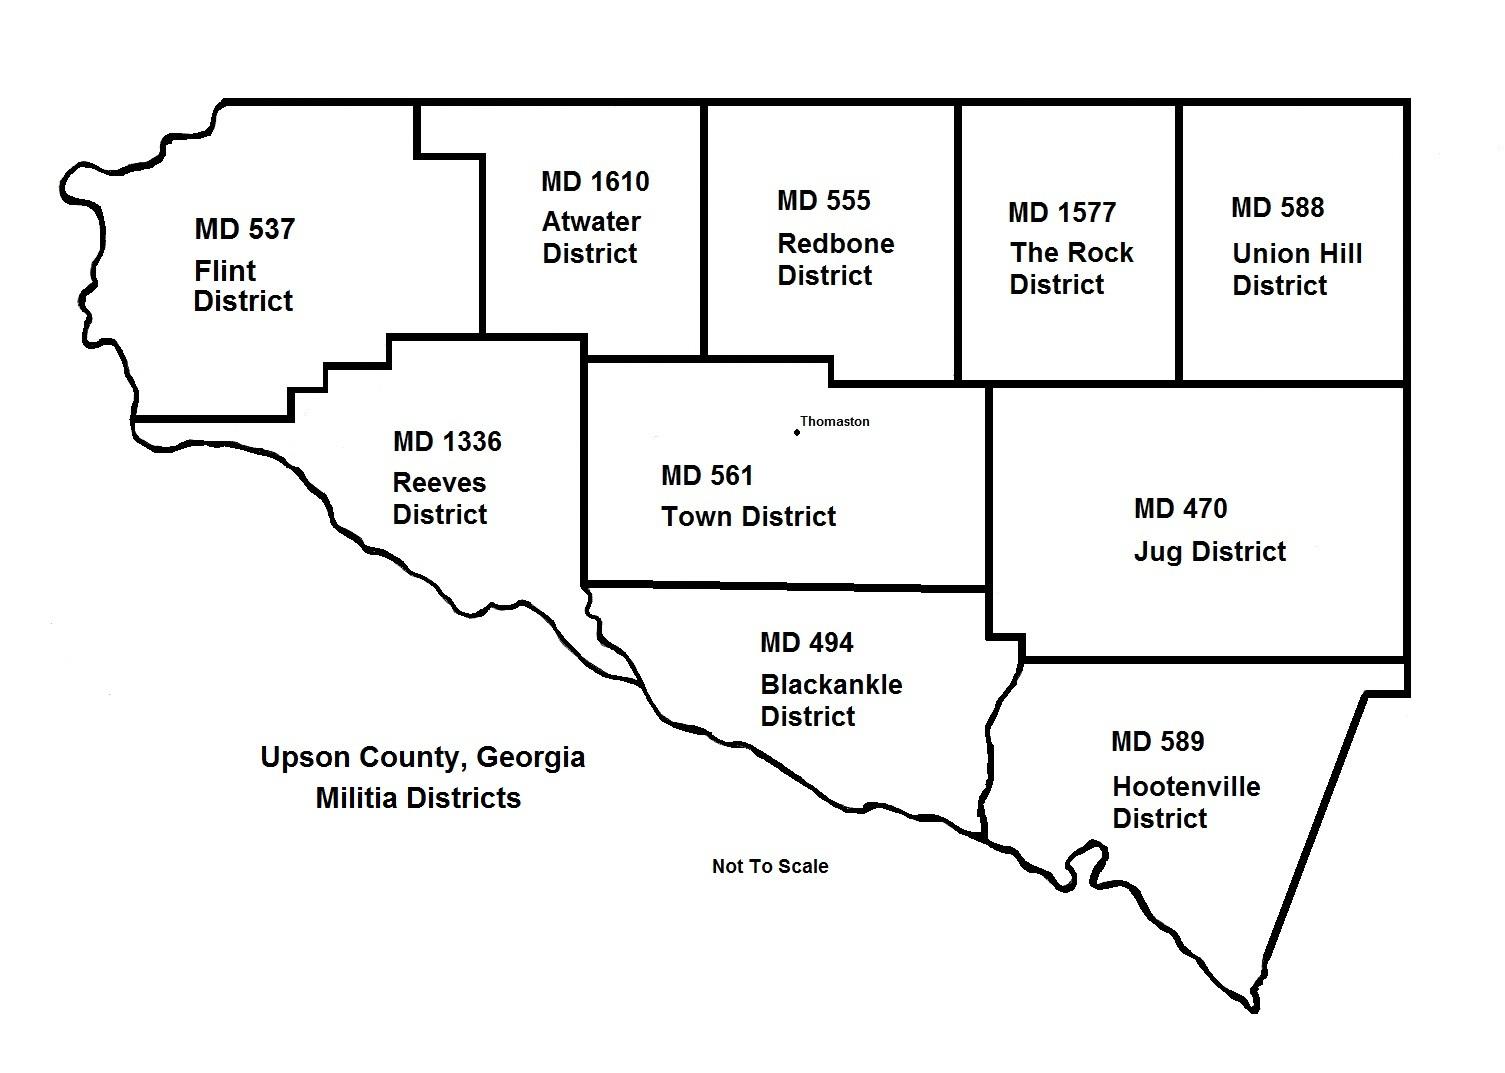 Map Of Georgia Militia Districts.Upson County Georgia Usgenweb Archives